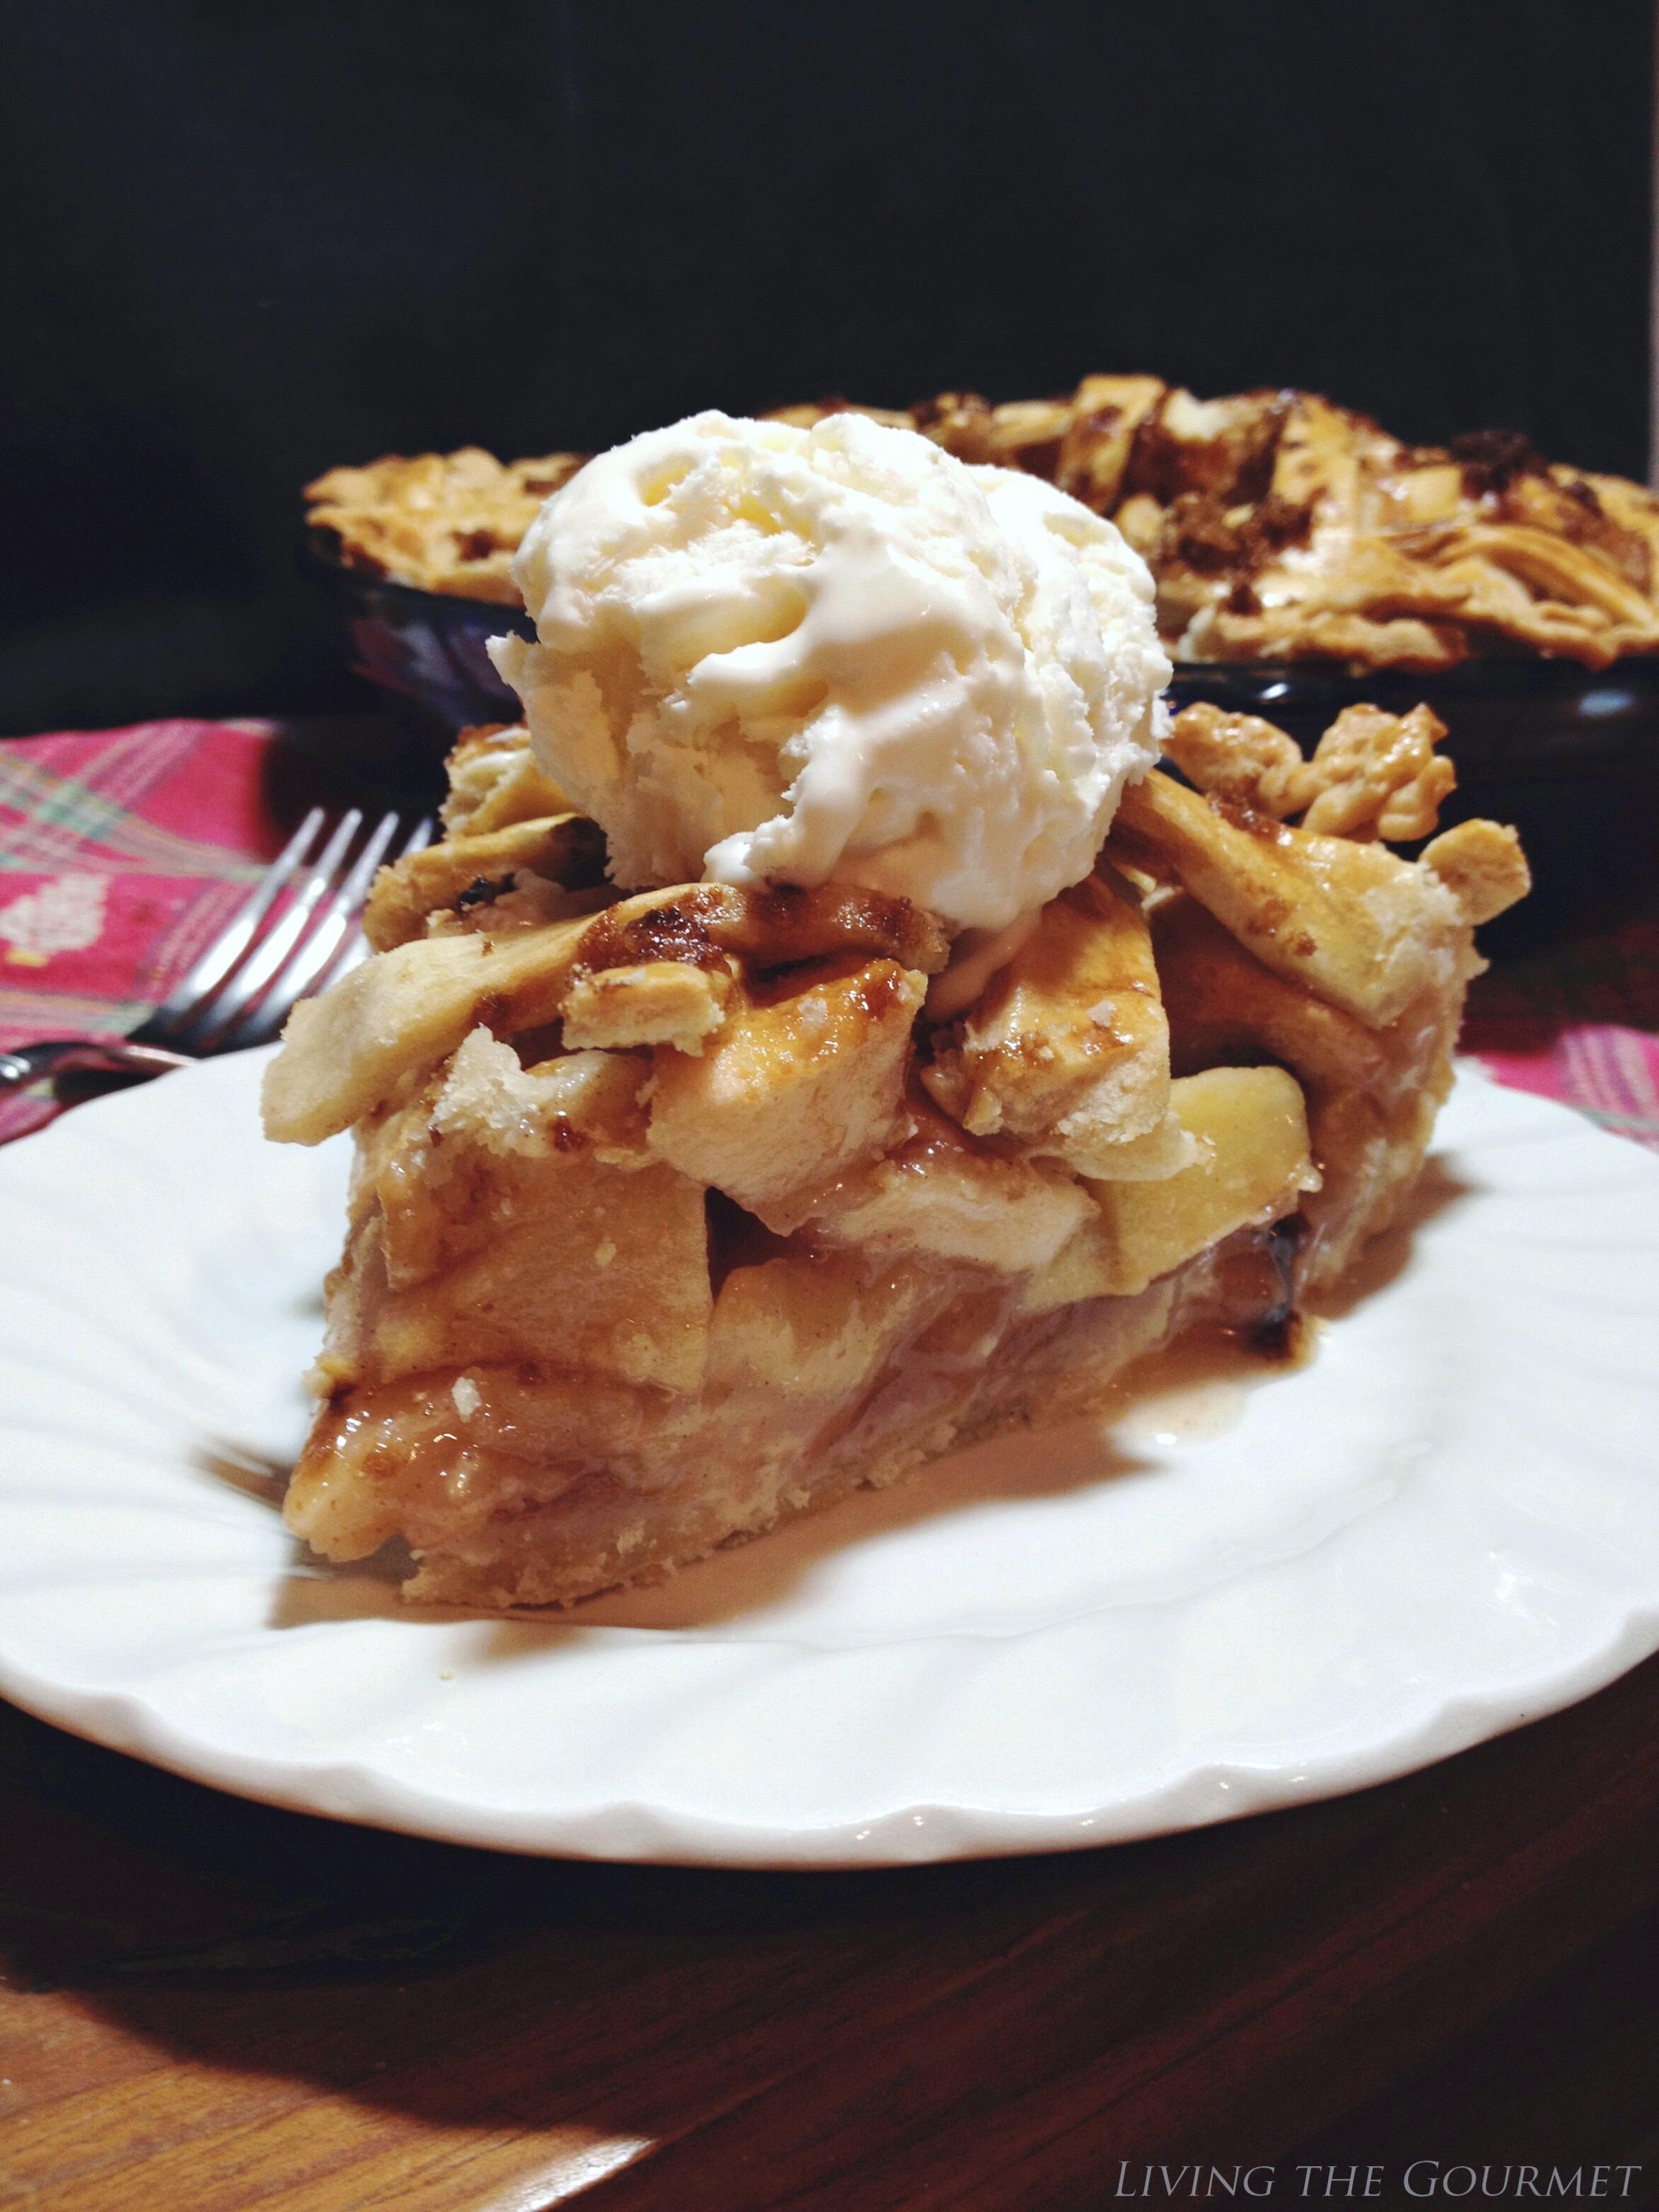 Living the Gourmet: Apple Brandy Pie